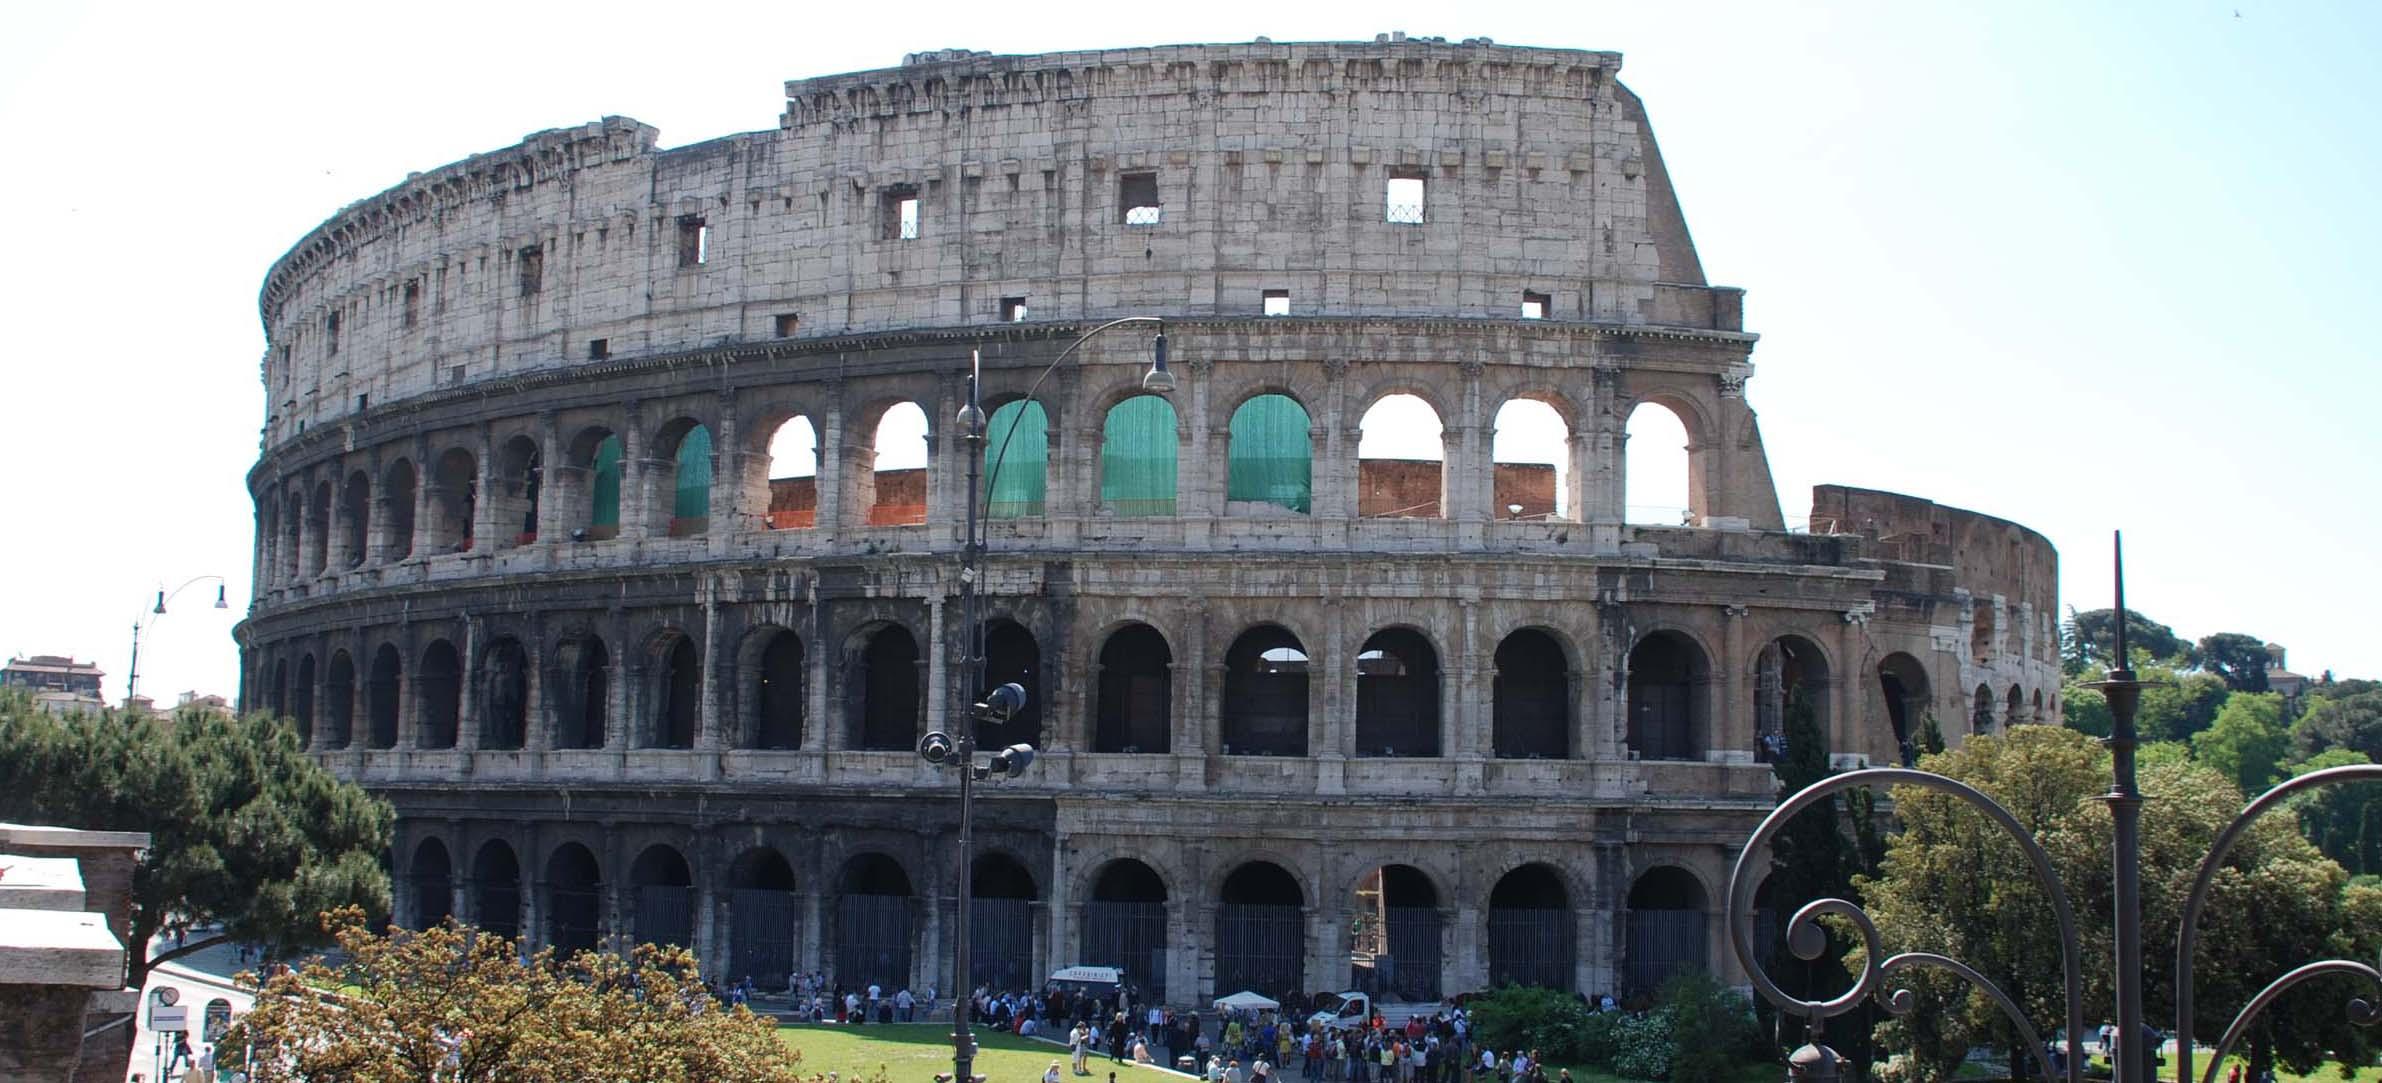 The Colosseum (Rome)